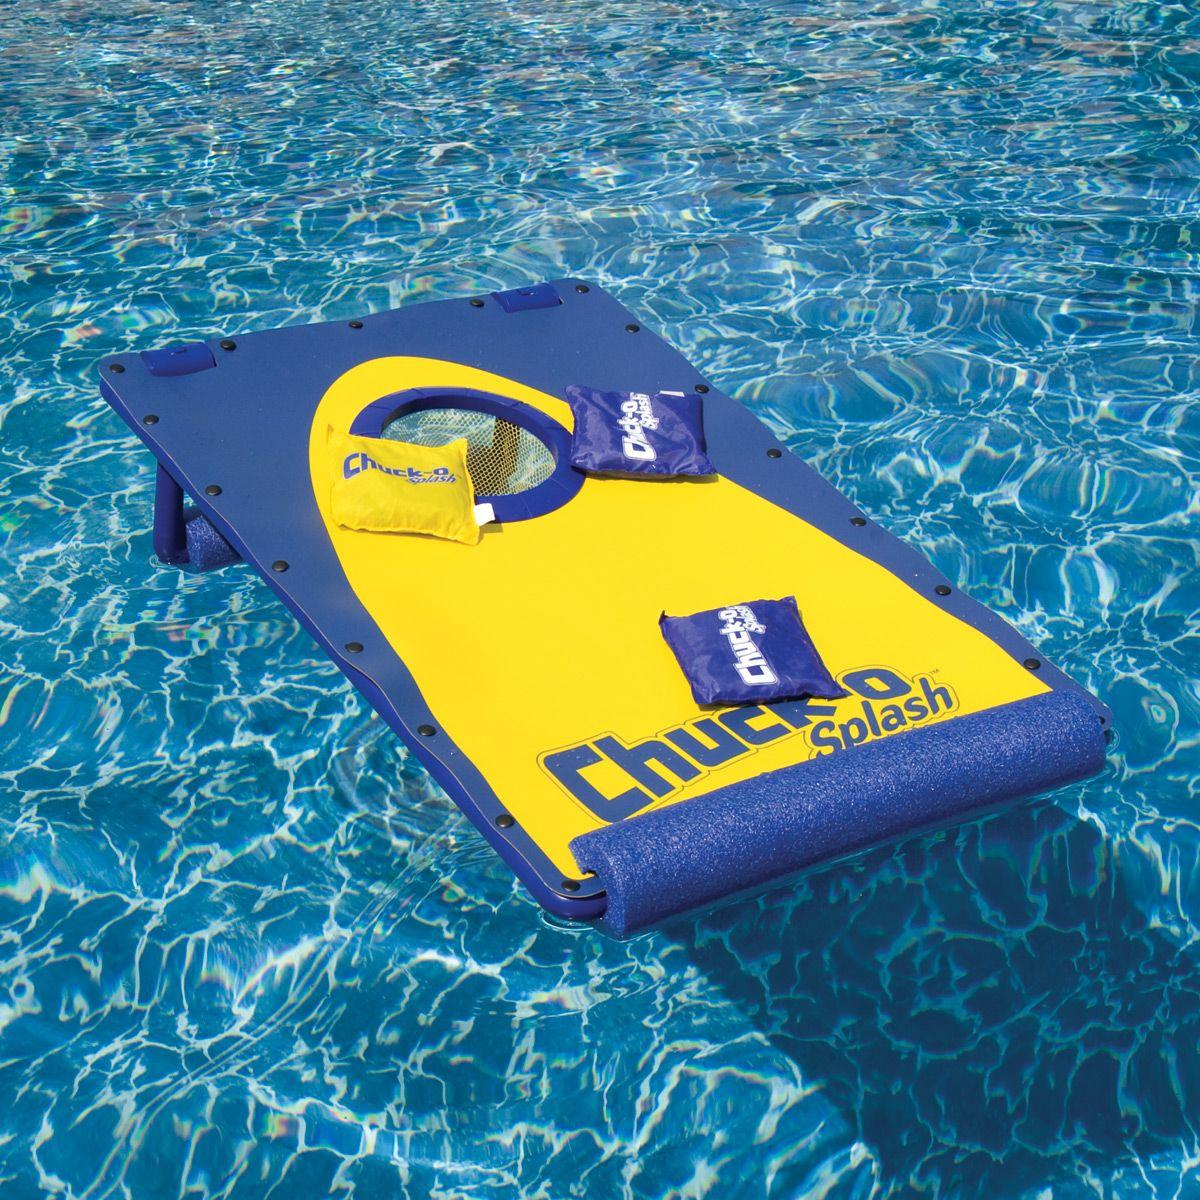 Chucko splash beanbag pool game pool games pool bags